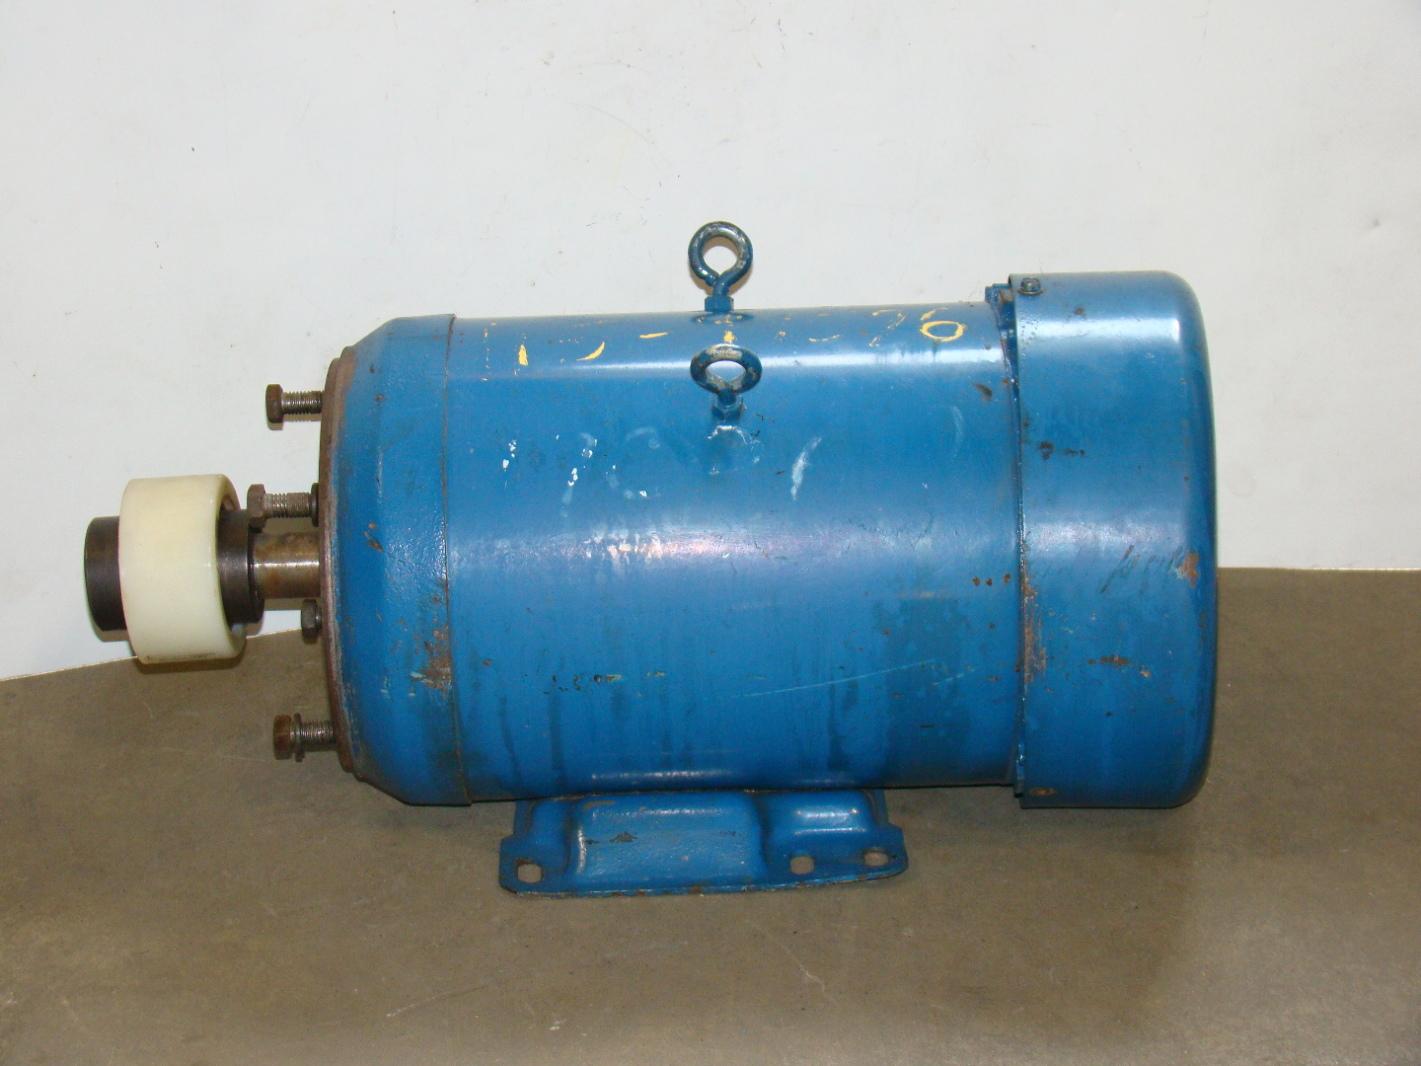 Leeson 5hp Electric Motor 460 860v C040246 Joseph Fazzio